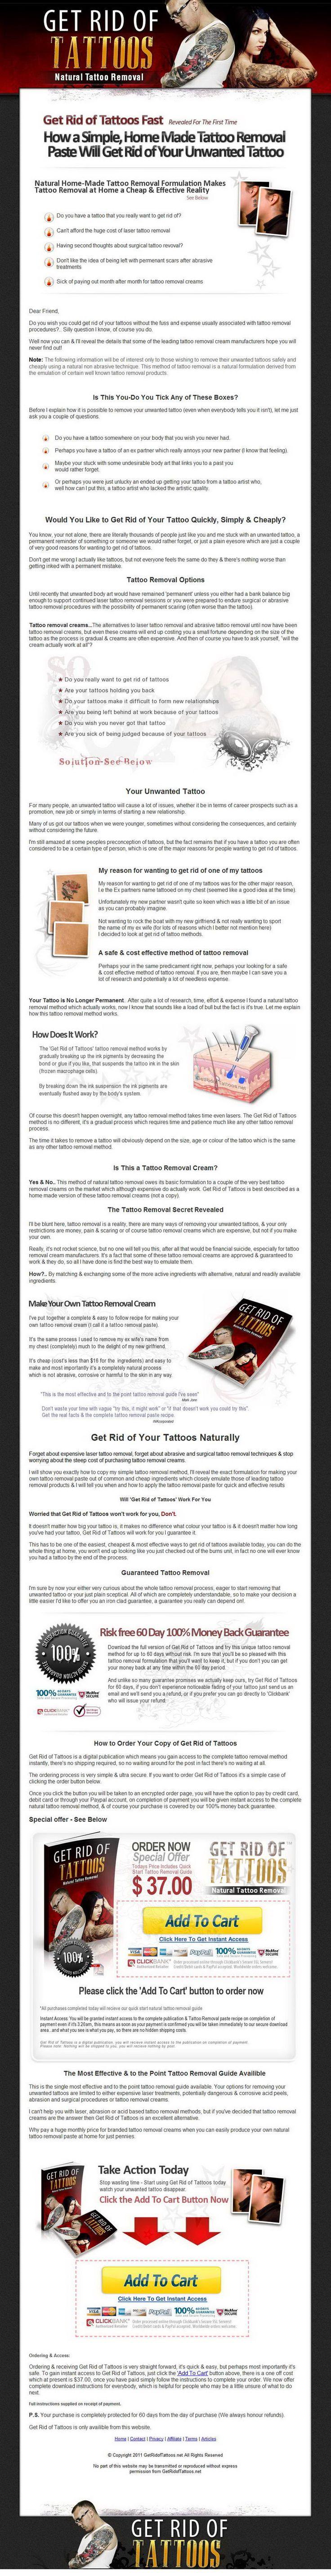 Best 25+ Make your own tattoo ideas on Pinterest | Henna recipe ...